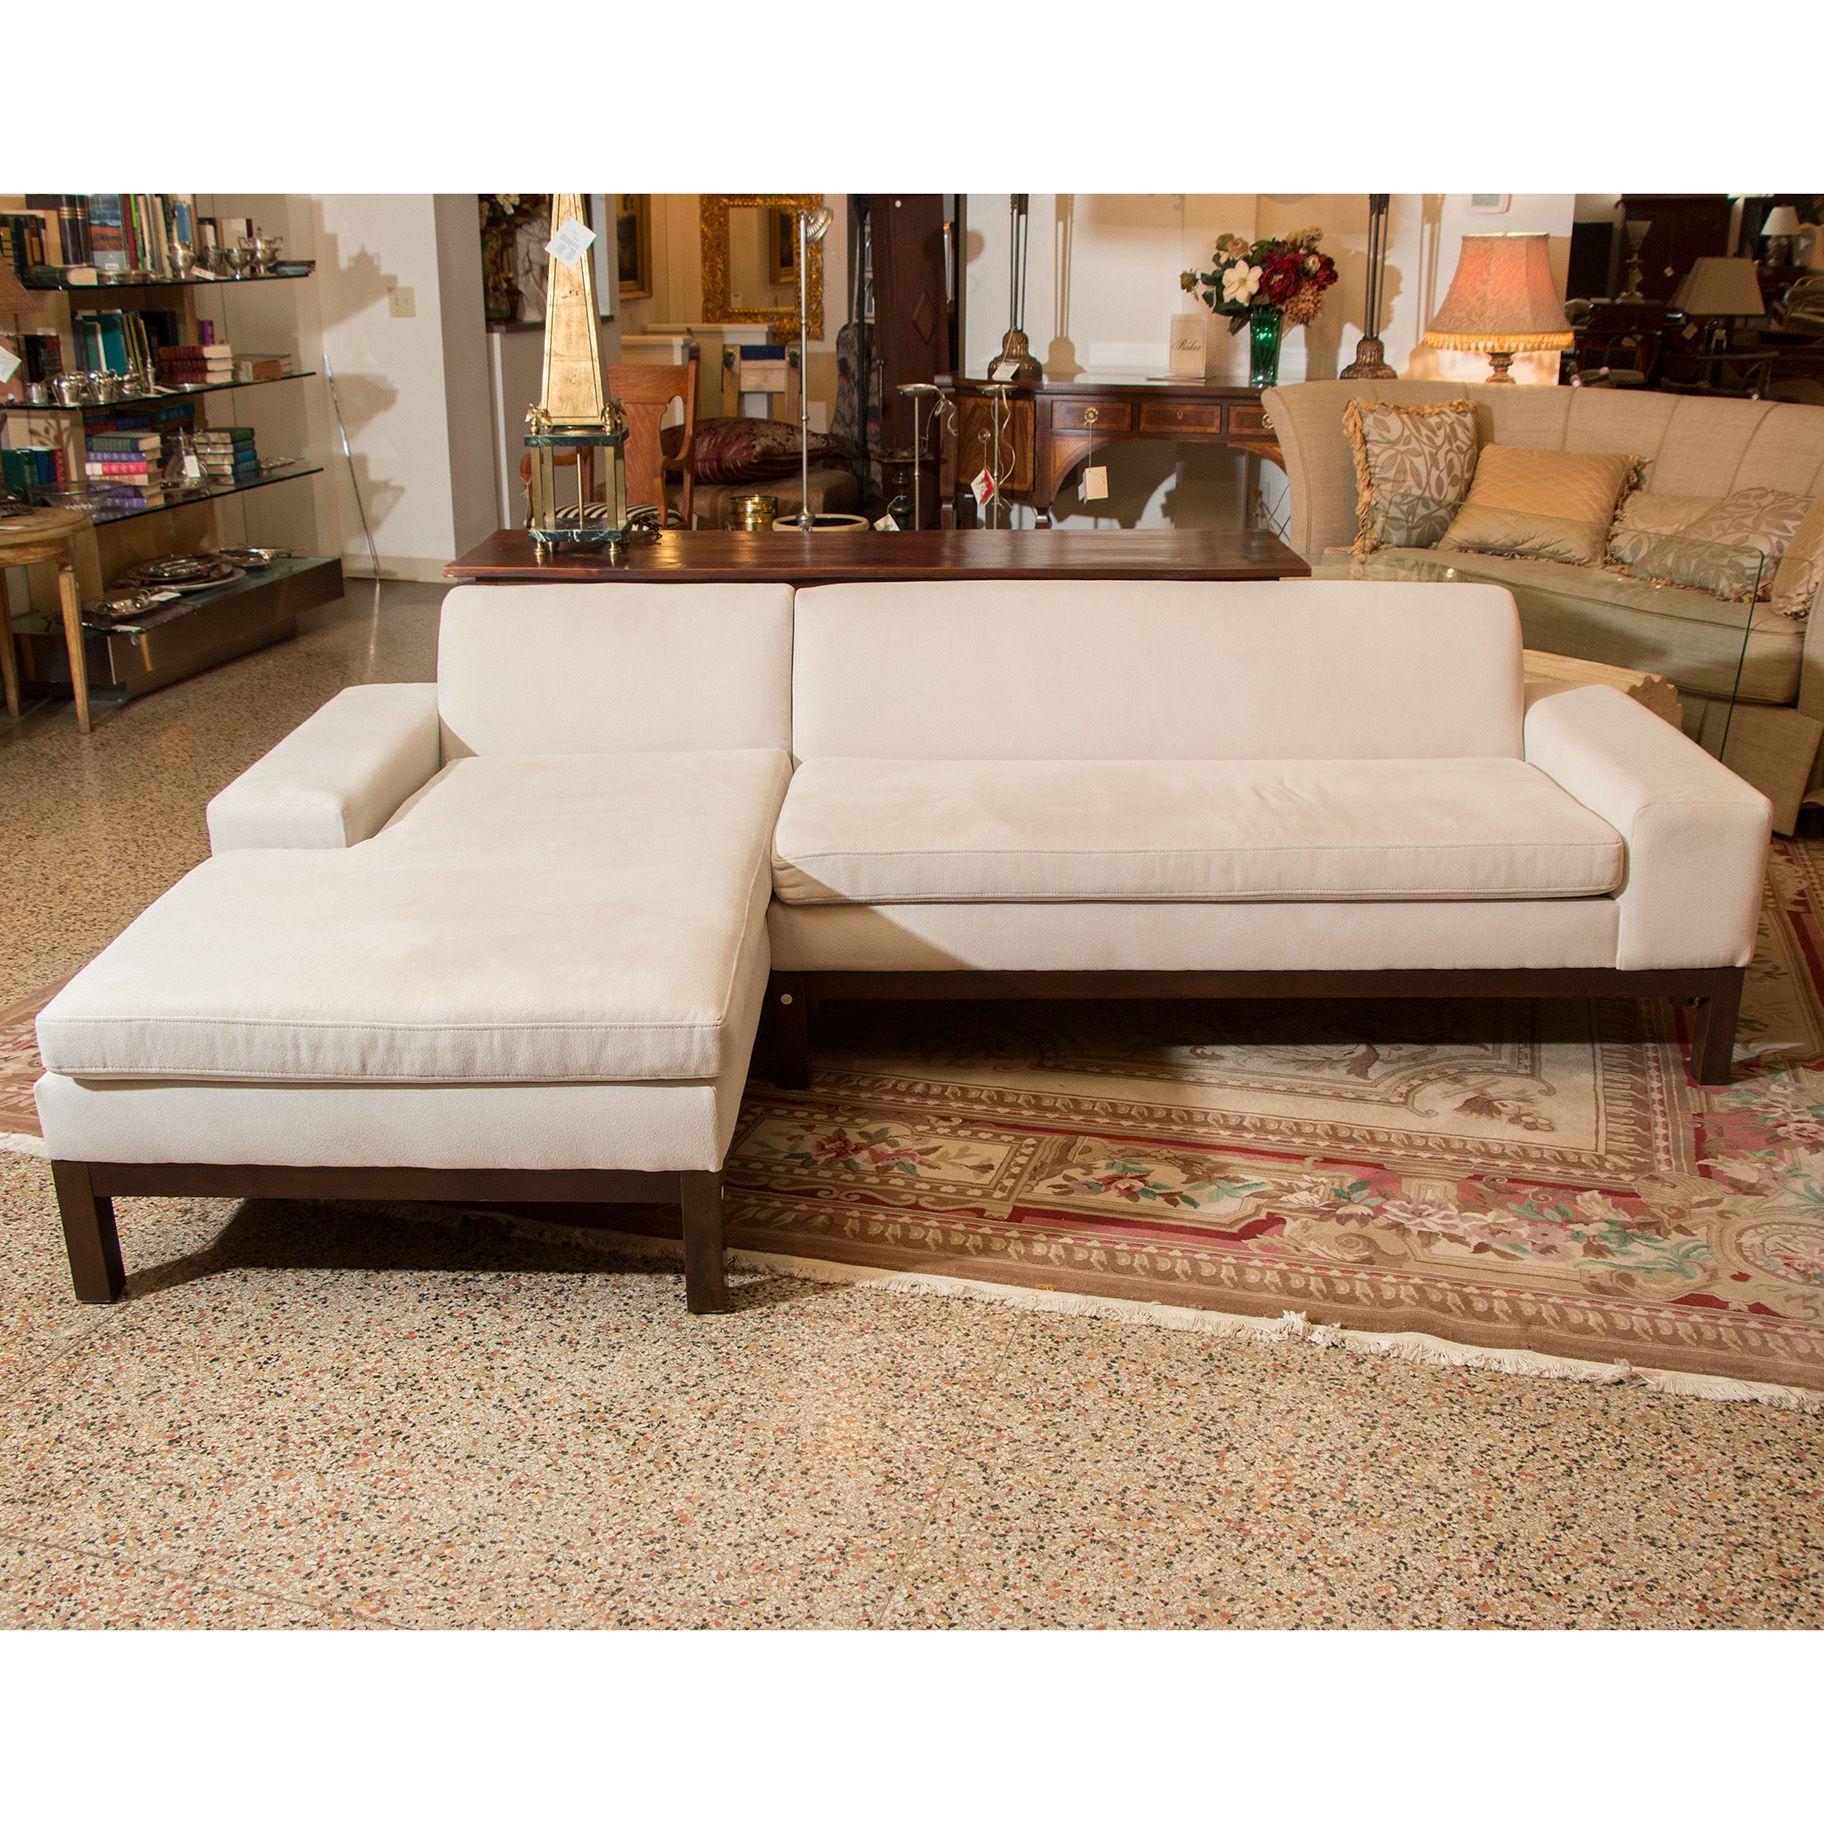 WEST ELM Lorimer Sectional in Monaco Linen Upholstery